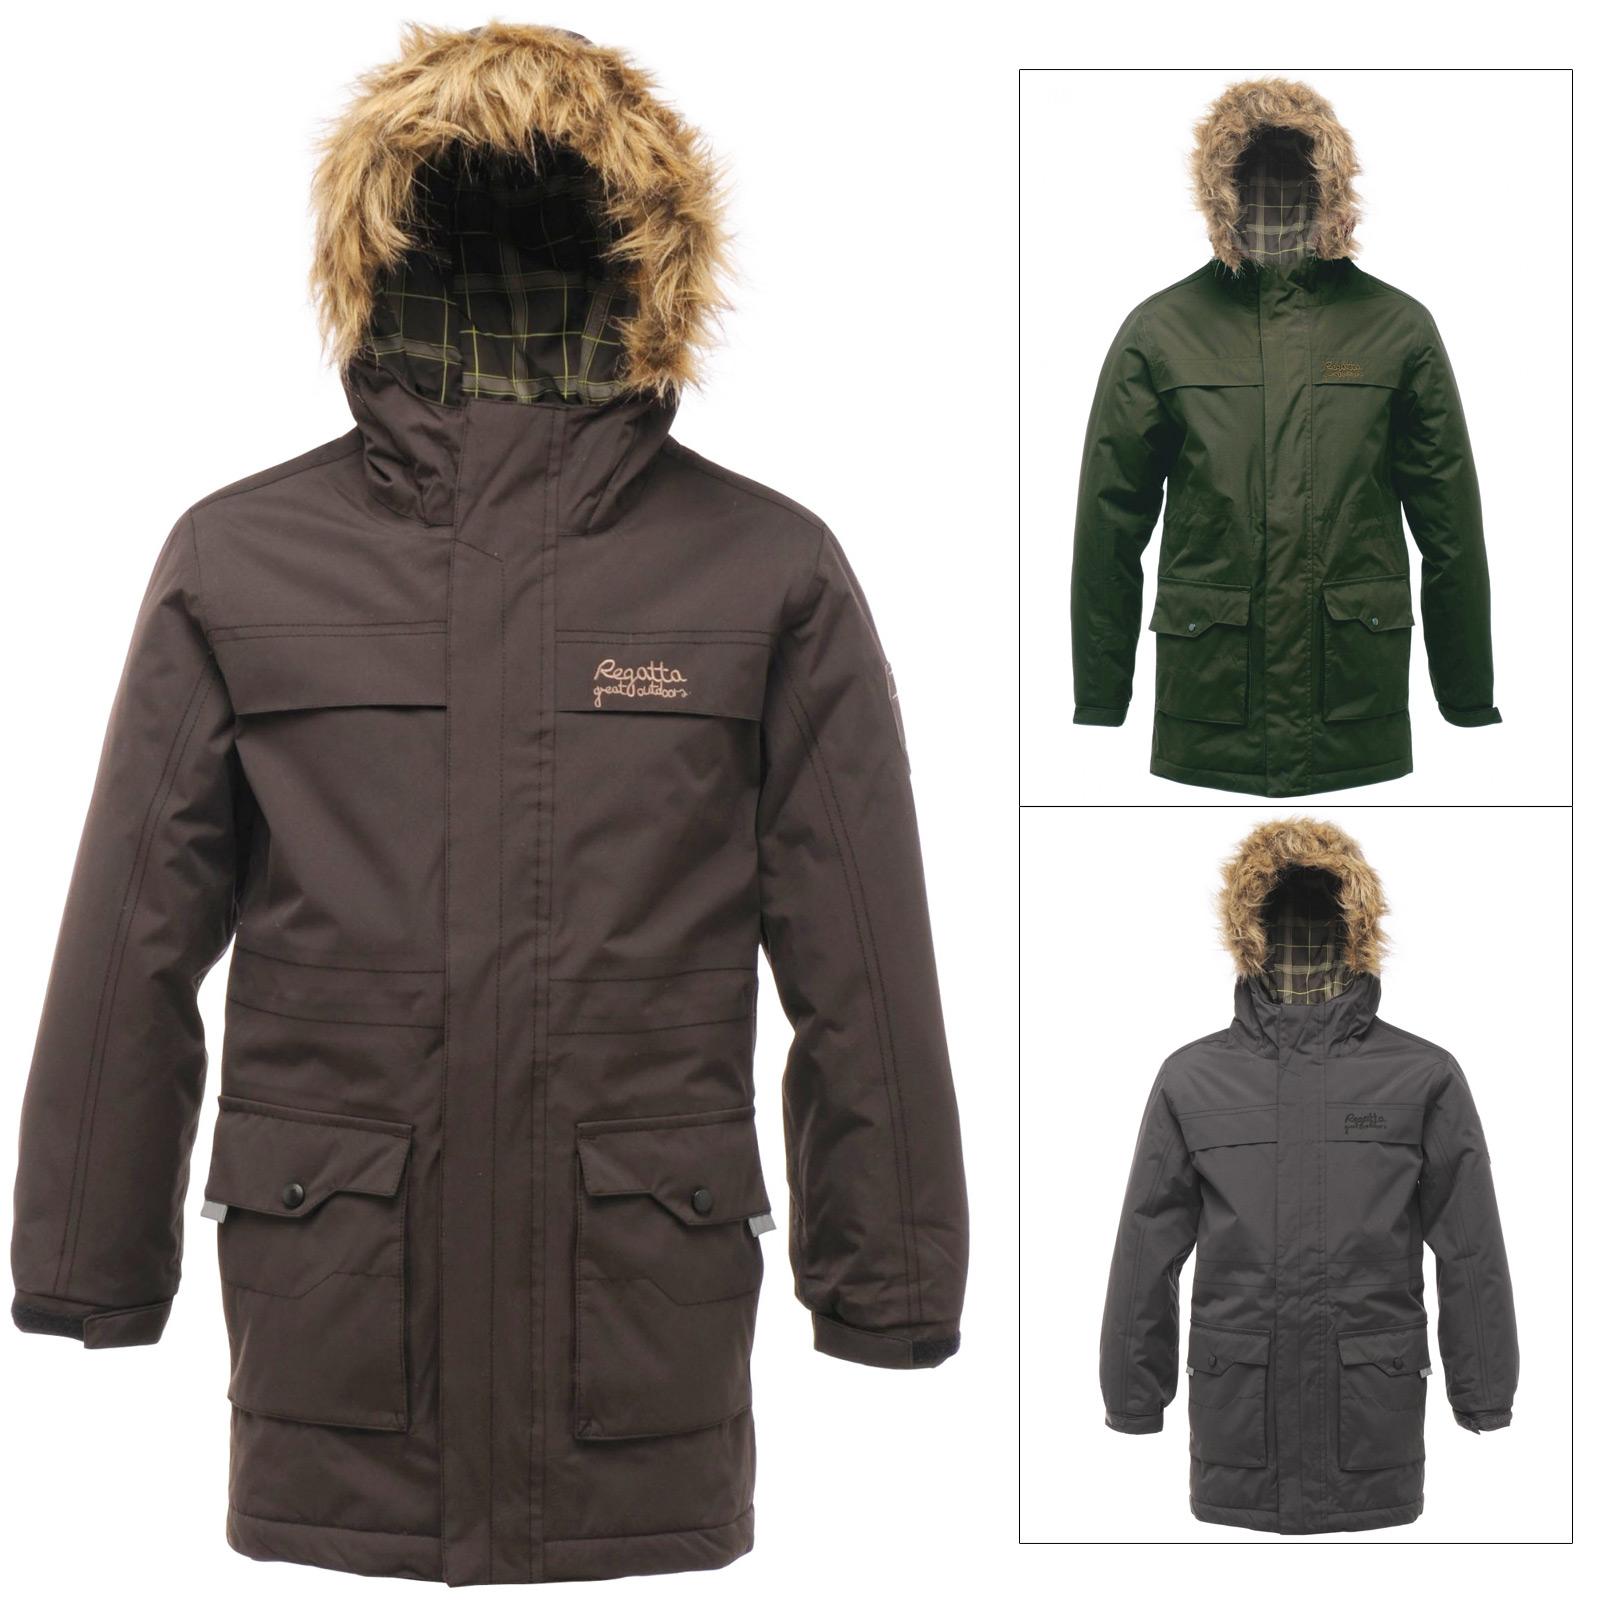 boys parka coats regatta boys waterproof rebellion parka jacket with faux fur trim hood warm  coat VOIHFED